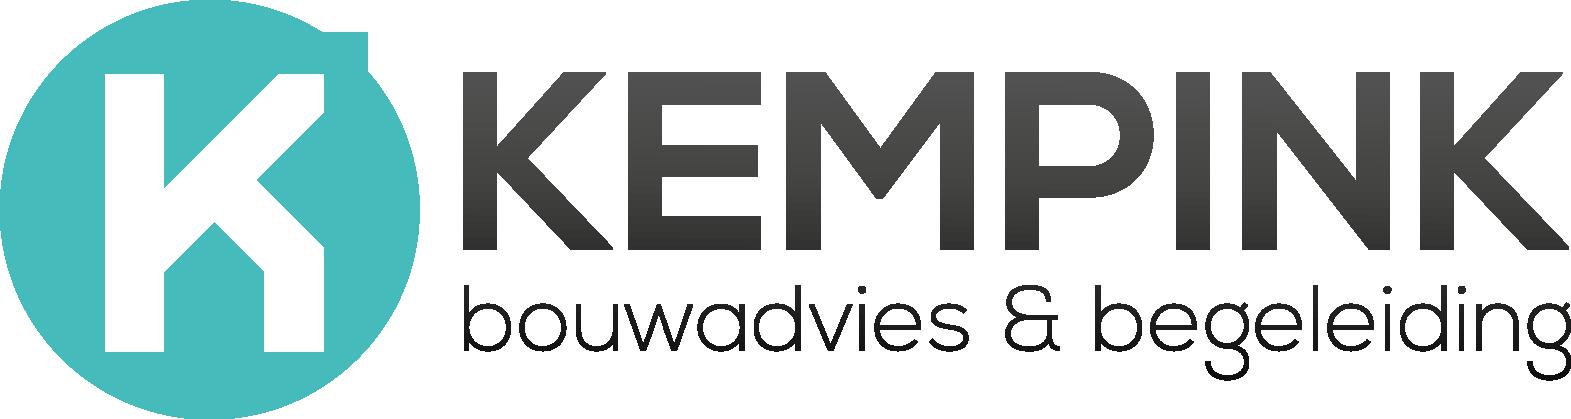 Kempink bouwadvies & begeleiding